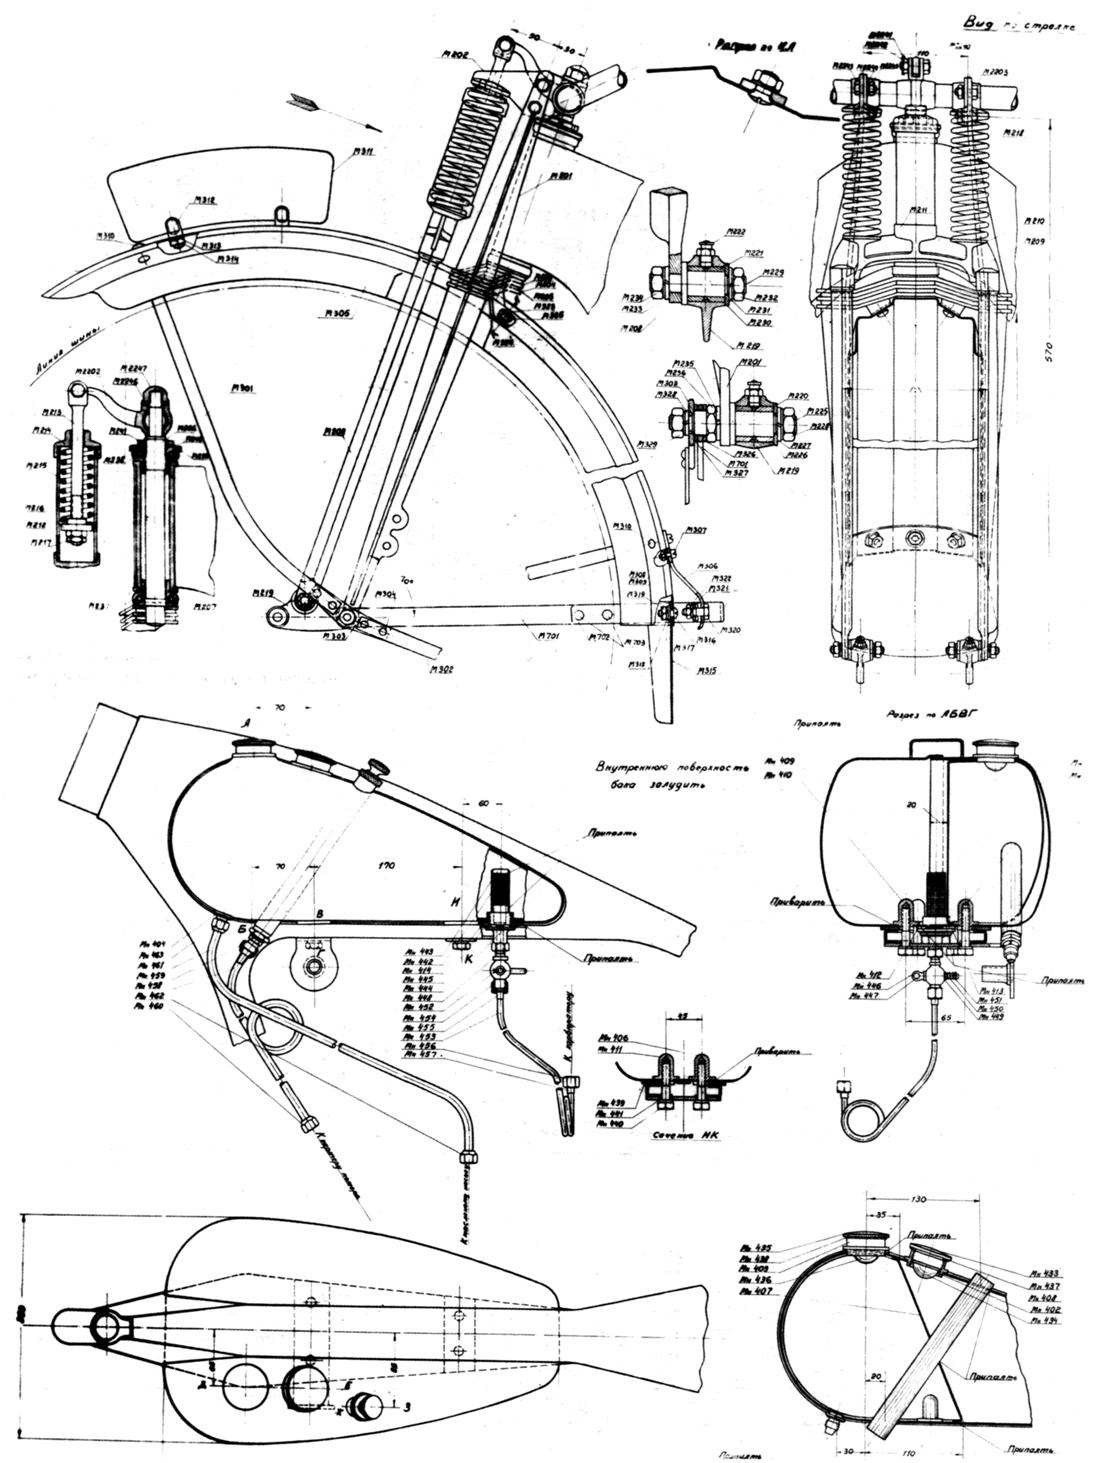 Заводские чертежи передней вилки, бензобака и топливопроводов мотоцикла 1М 350